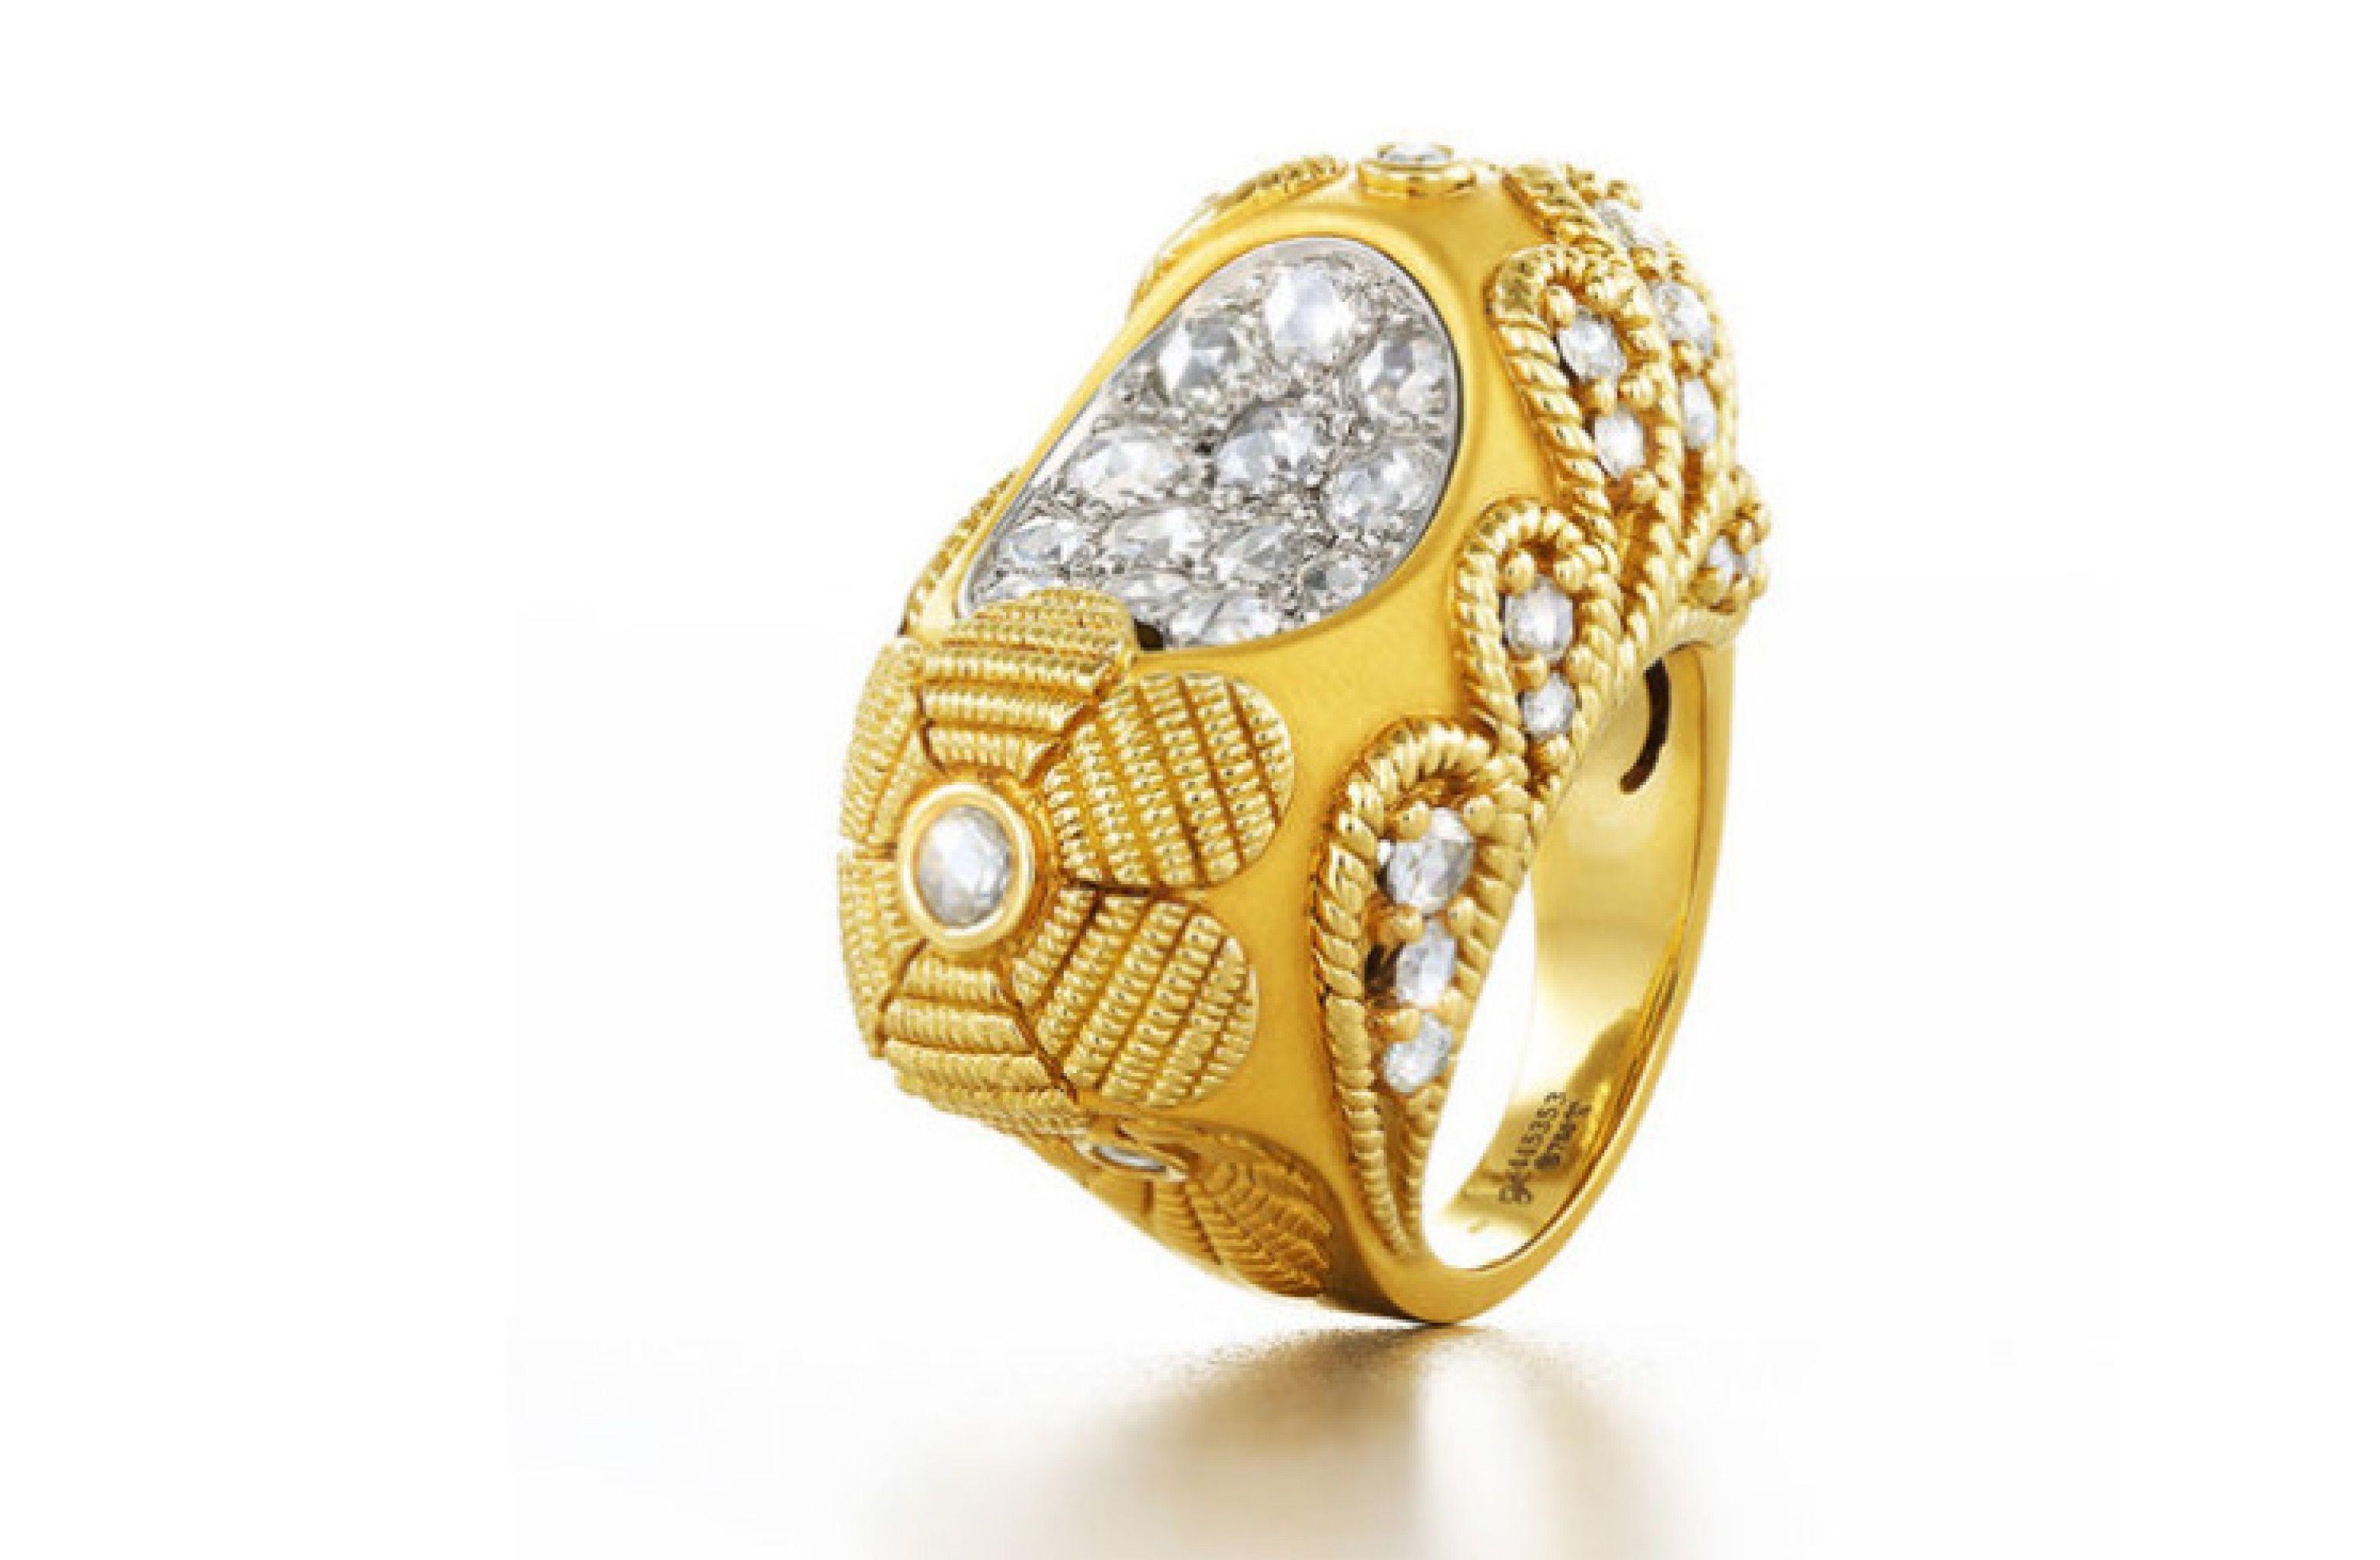 JewelryWhite_12.jpg